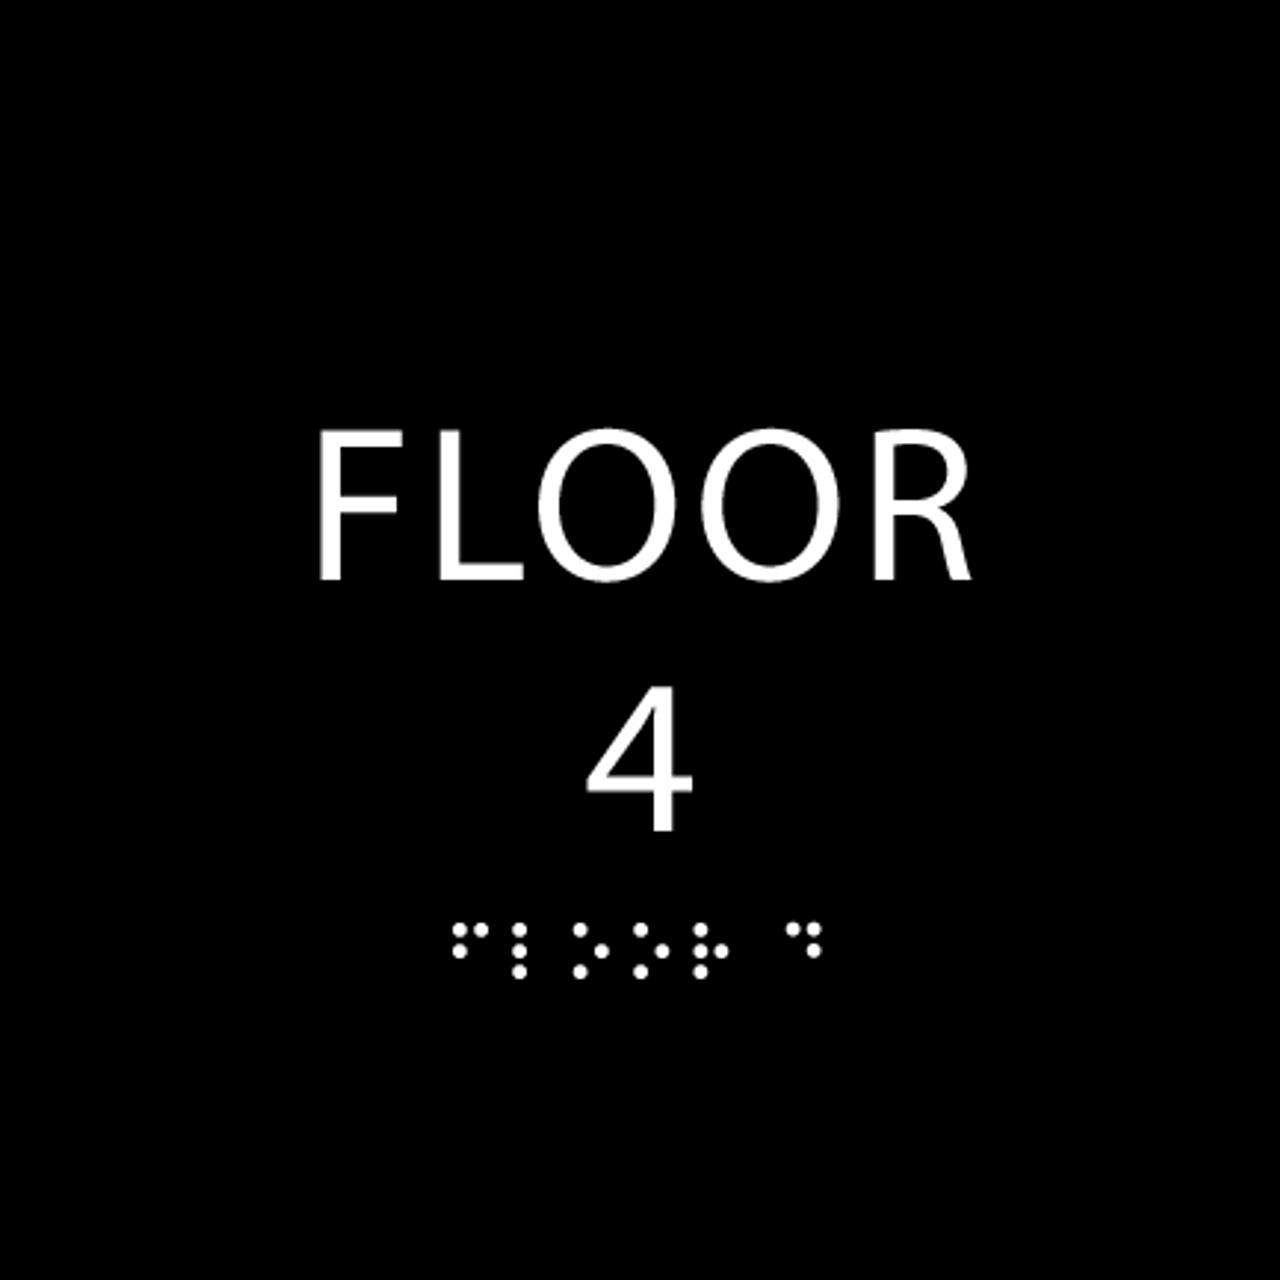 Black Floor 4 Identification Sign